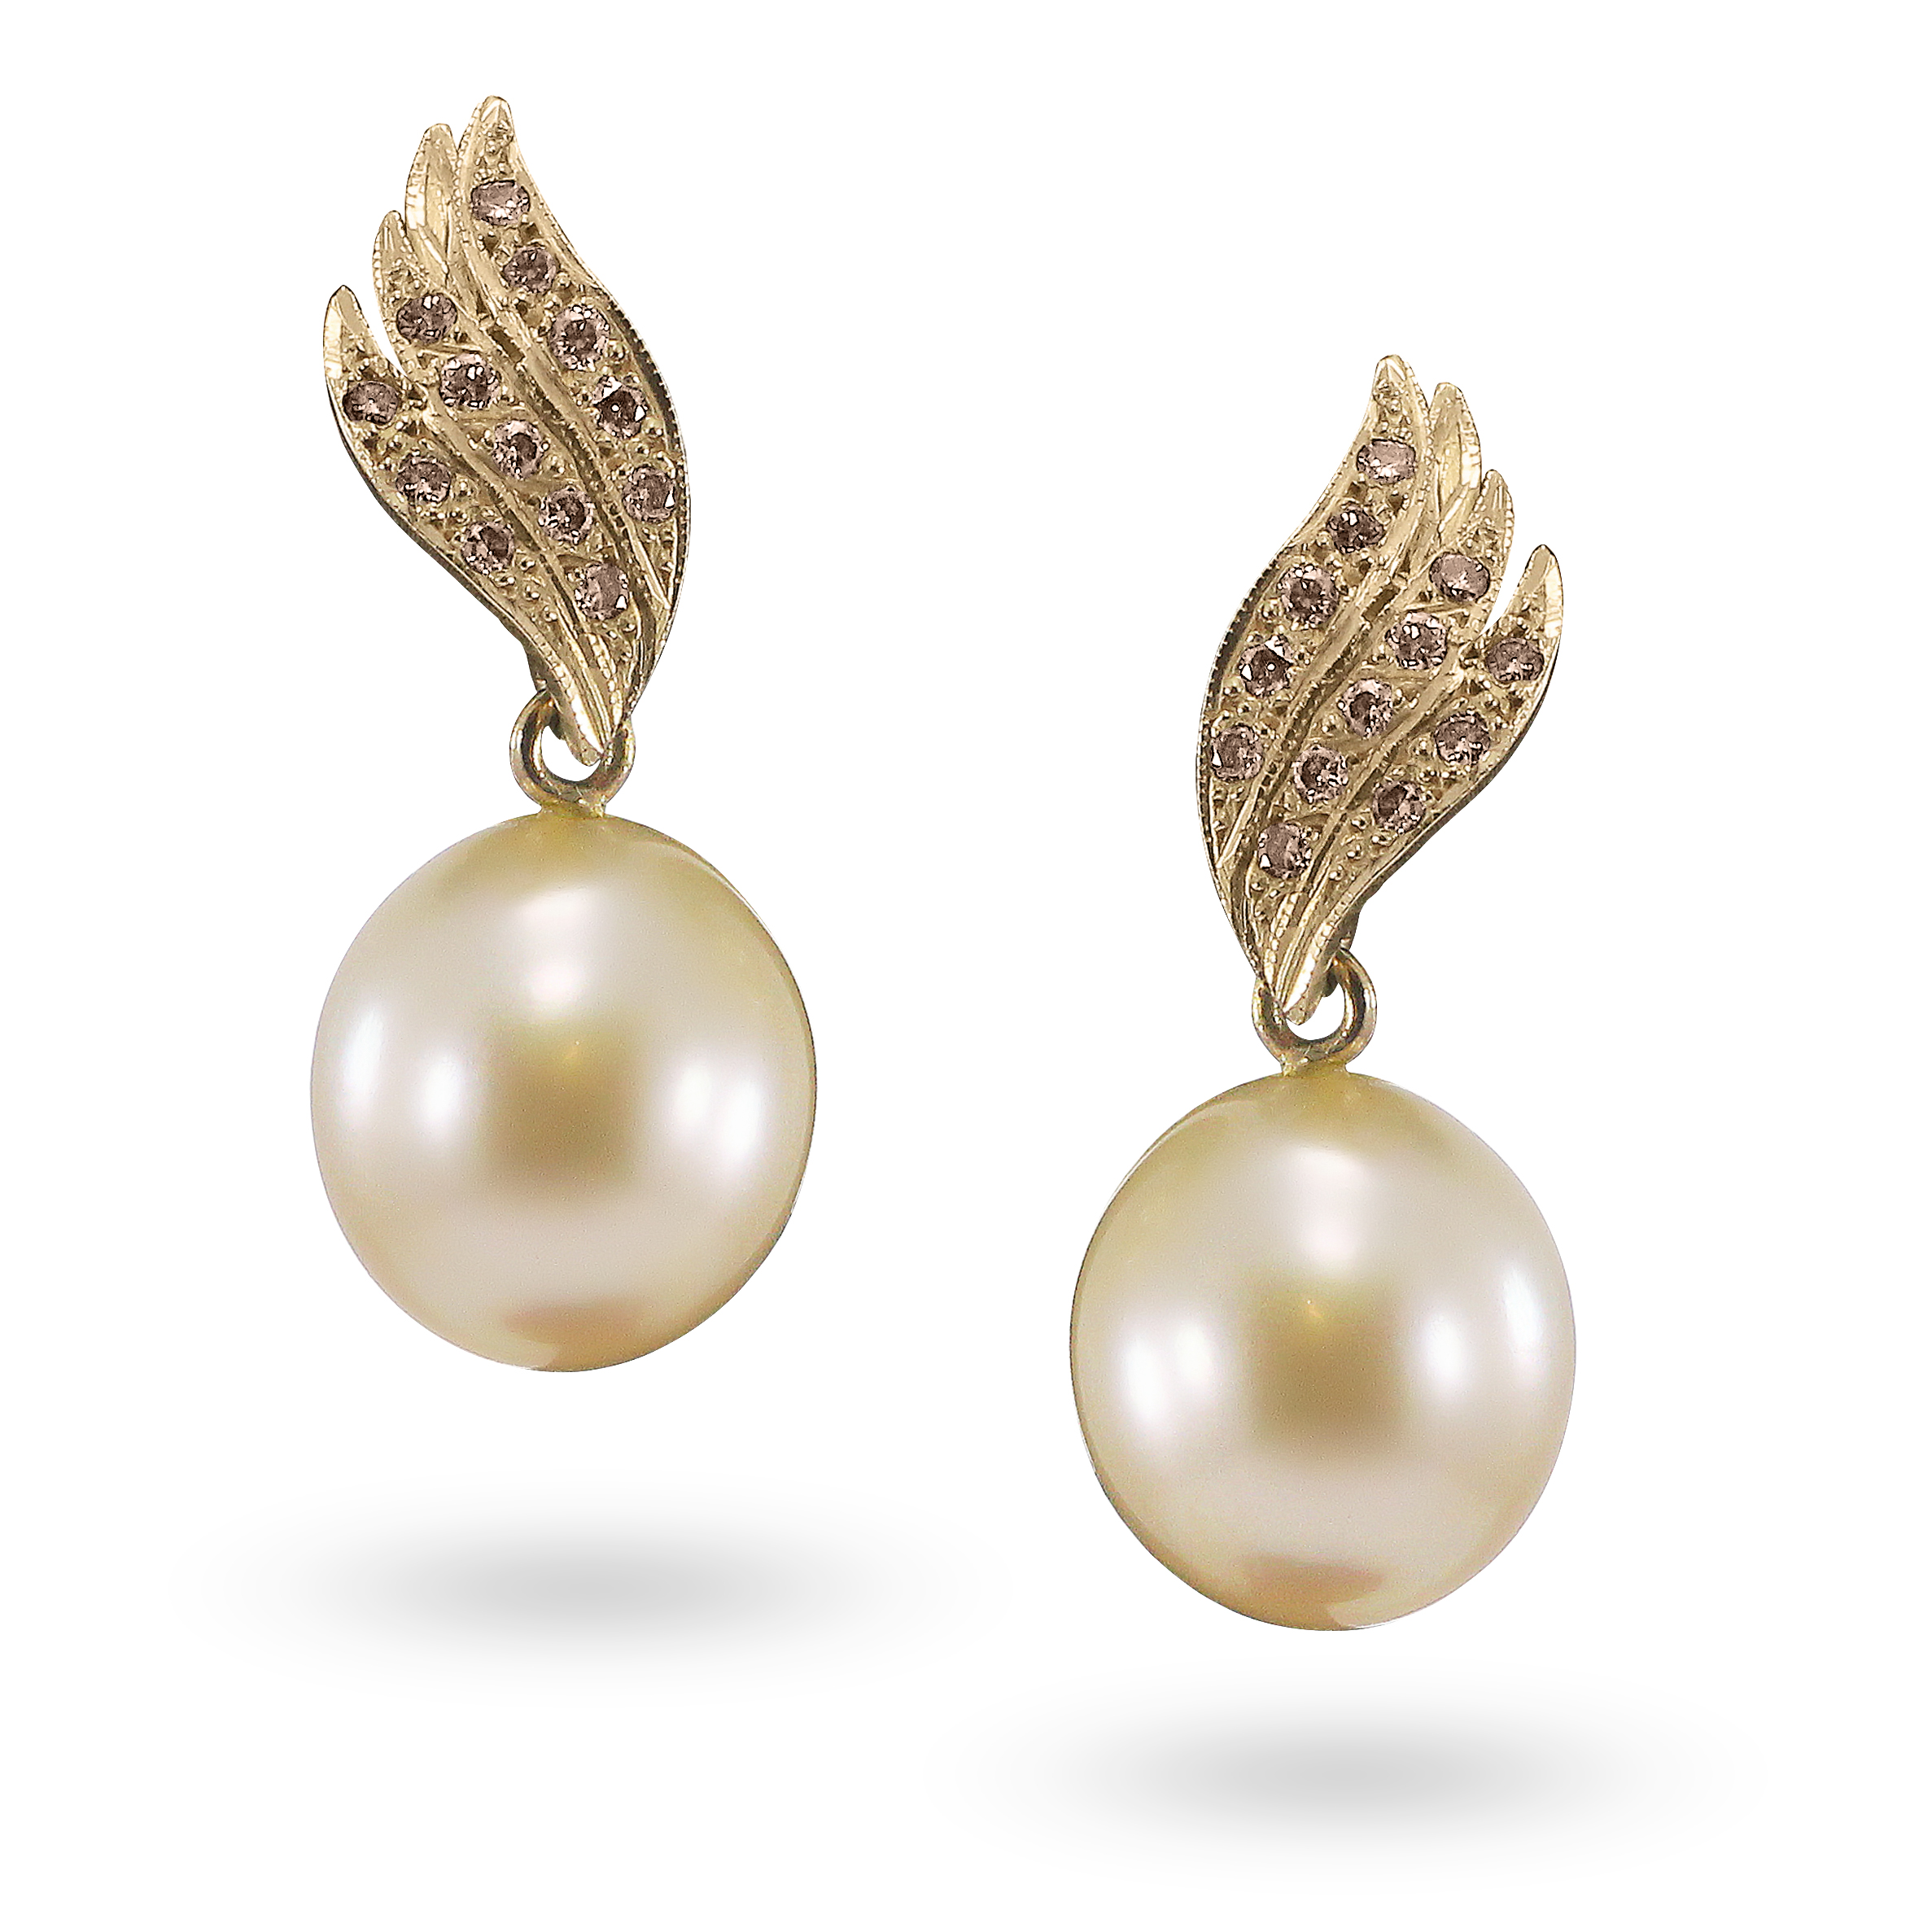 Broome Pearl & Champagne Diamond Earrings.jpg